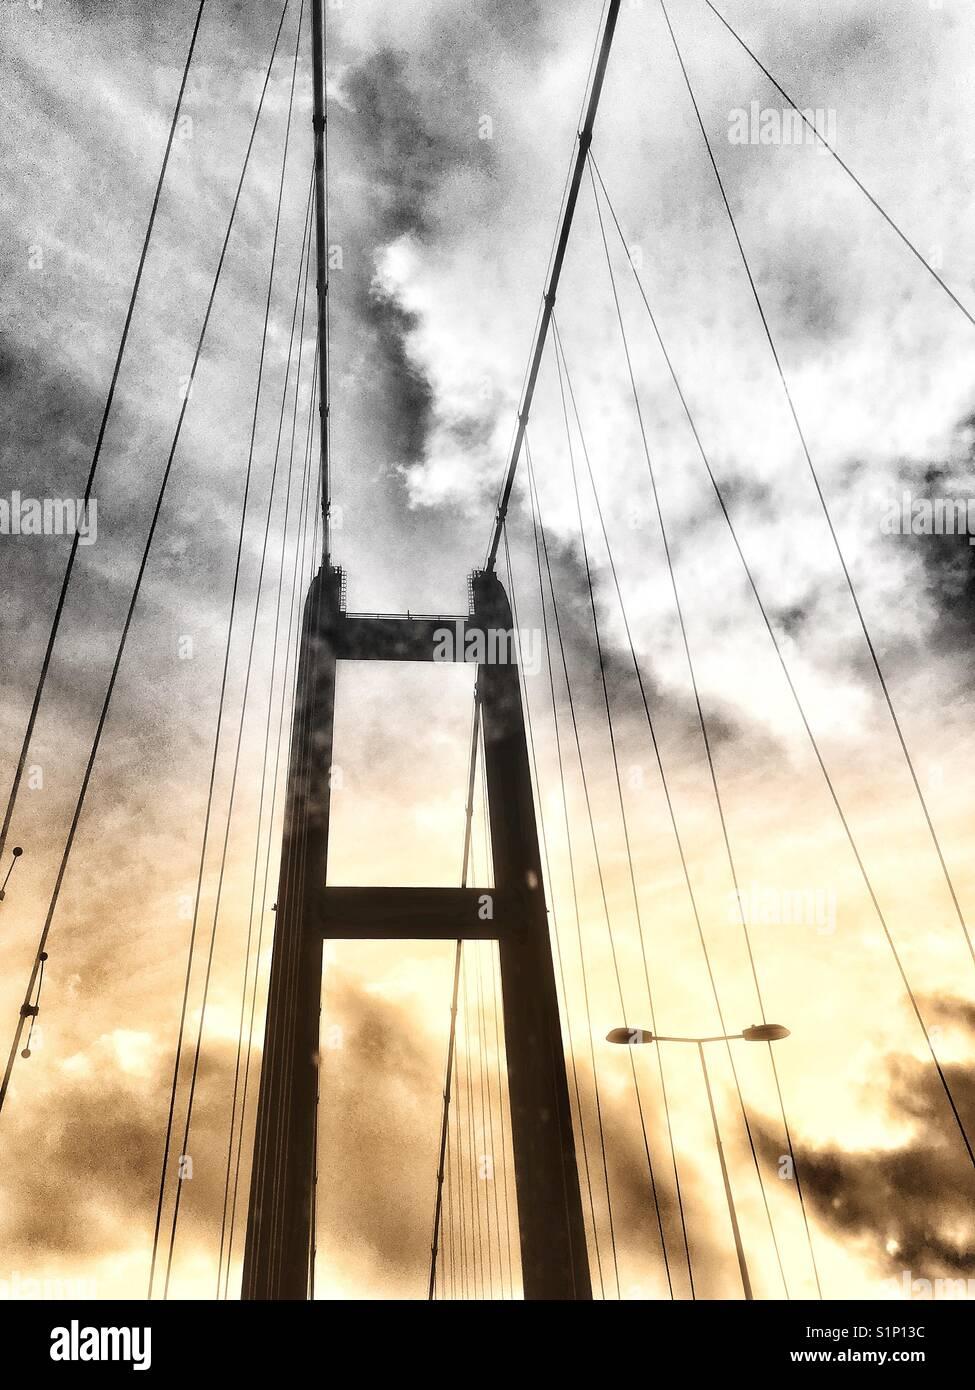 Split tone image of the Humber bridge single span bridge. England UK, low angle graphic viewpoint - Stock Image